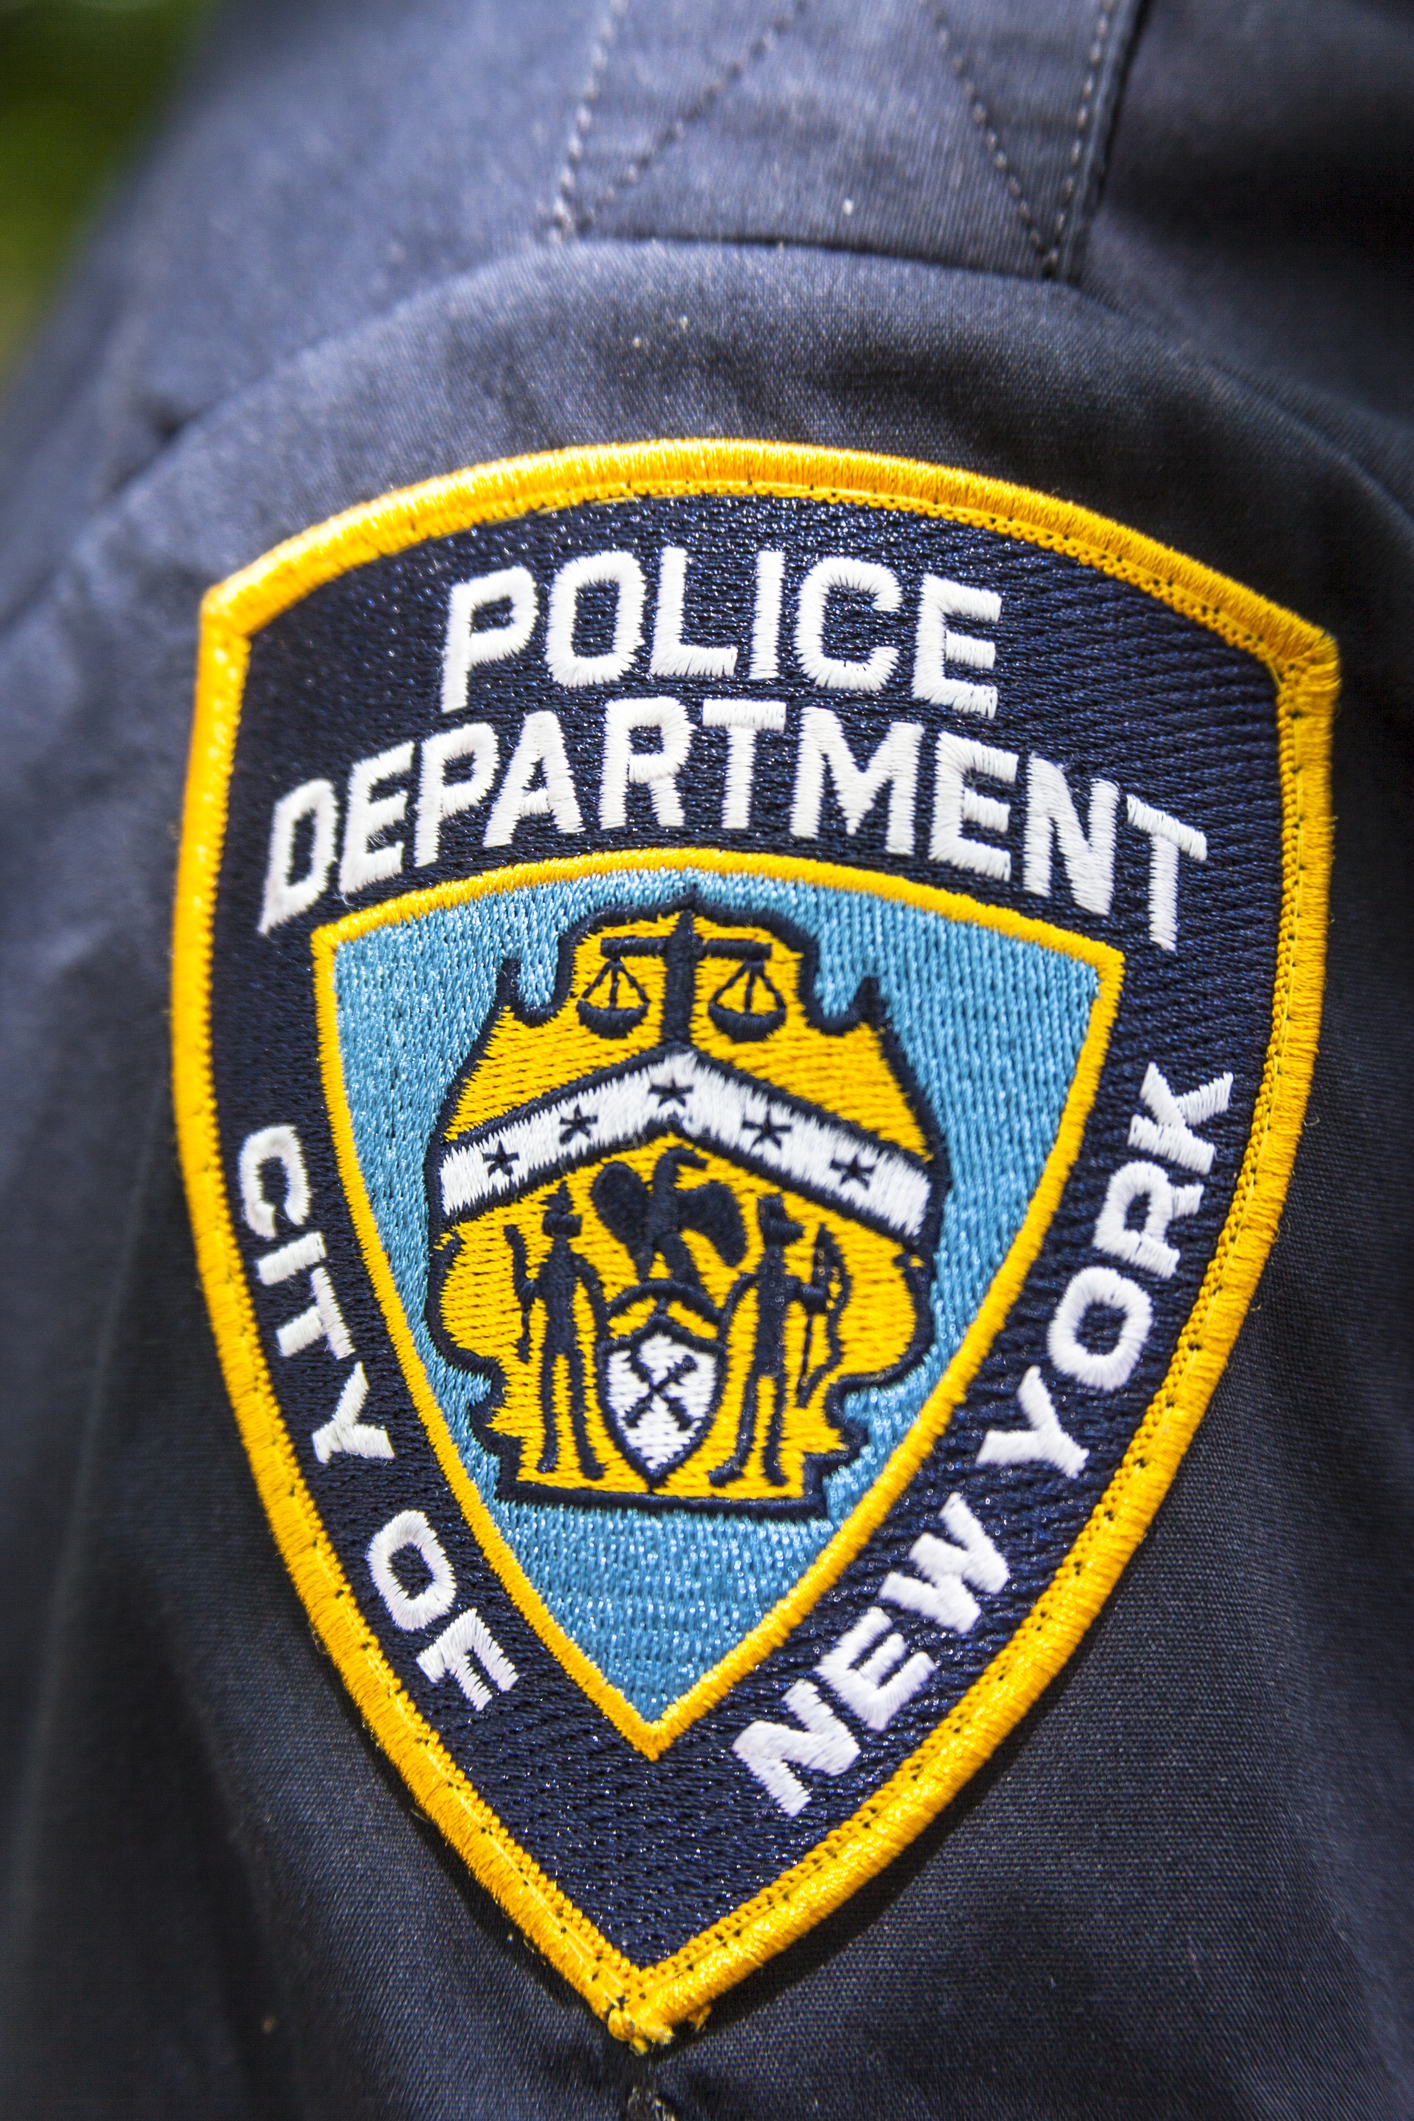 New York Police Department badge on policeman's shirt, NYPD, Manhattan, New York City, New York, USA